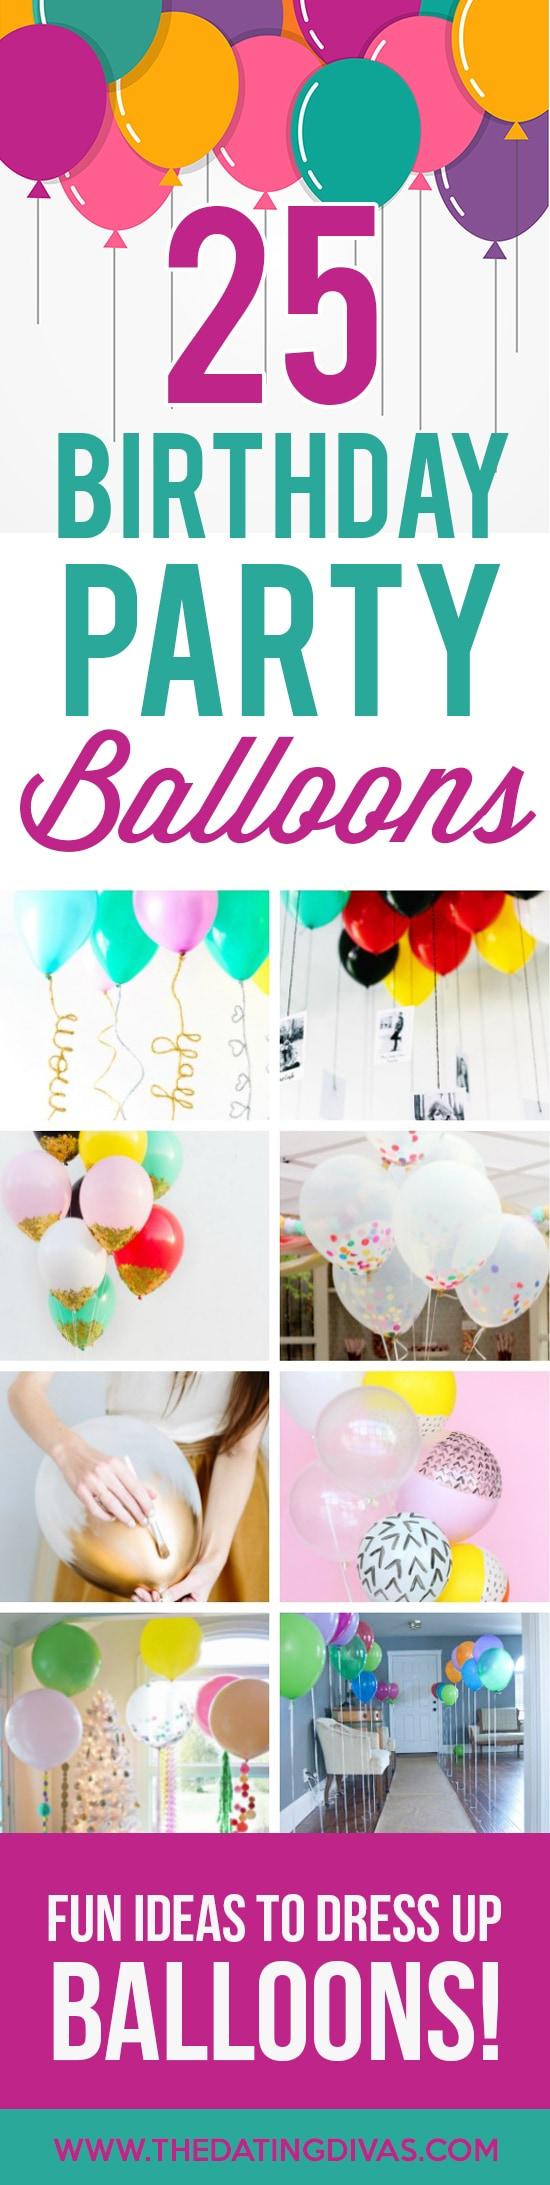 25 Creative Birthday Party Balloon Ideas